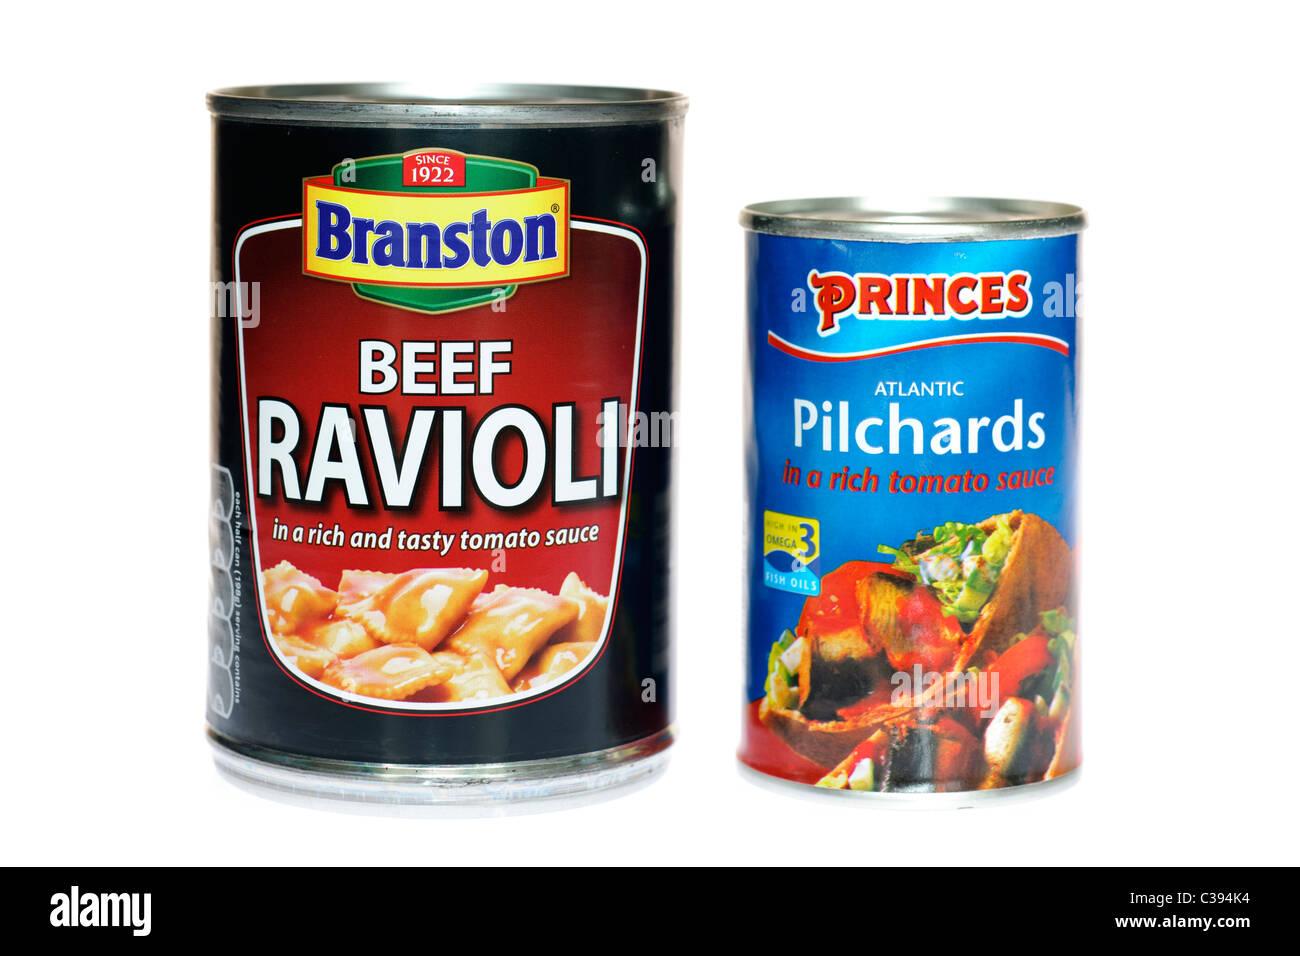 395 and 155 gram tins of Branston Ravioli and Princes Atlantic Pilchards - Stock Image